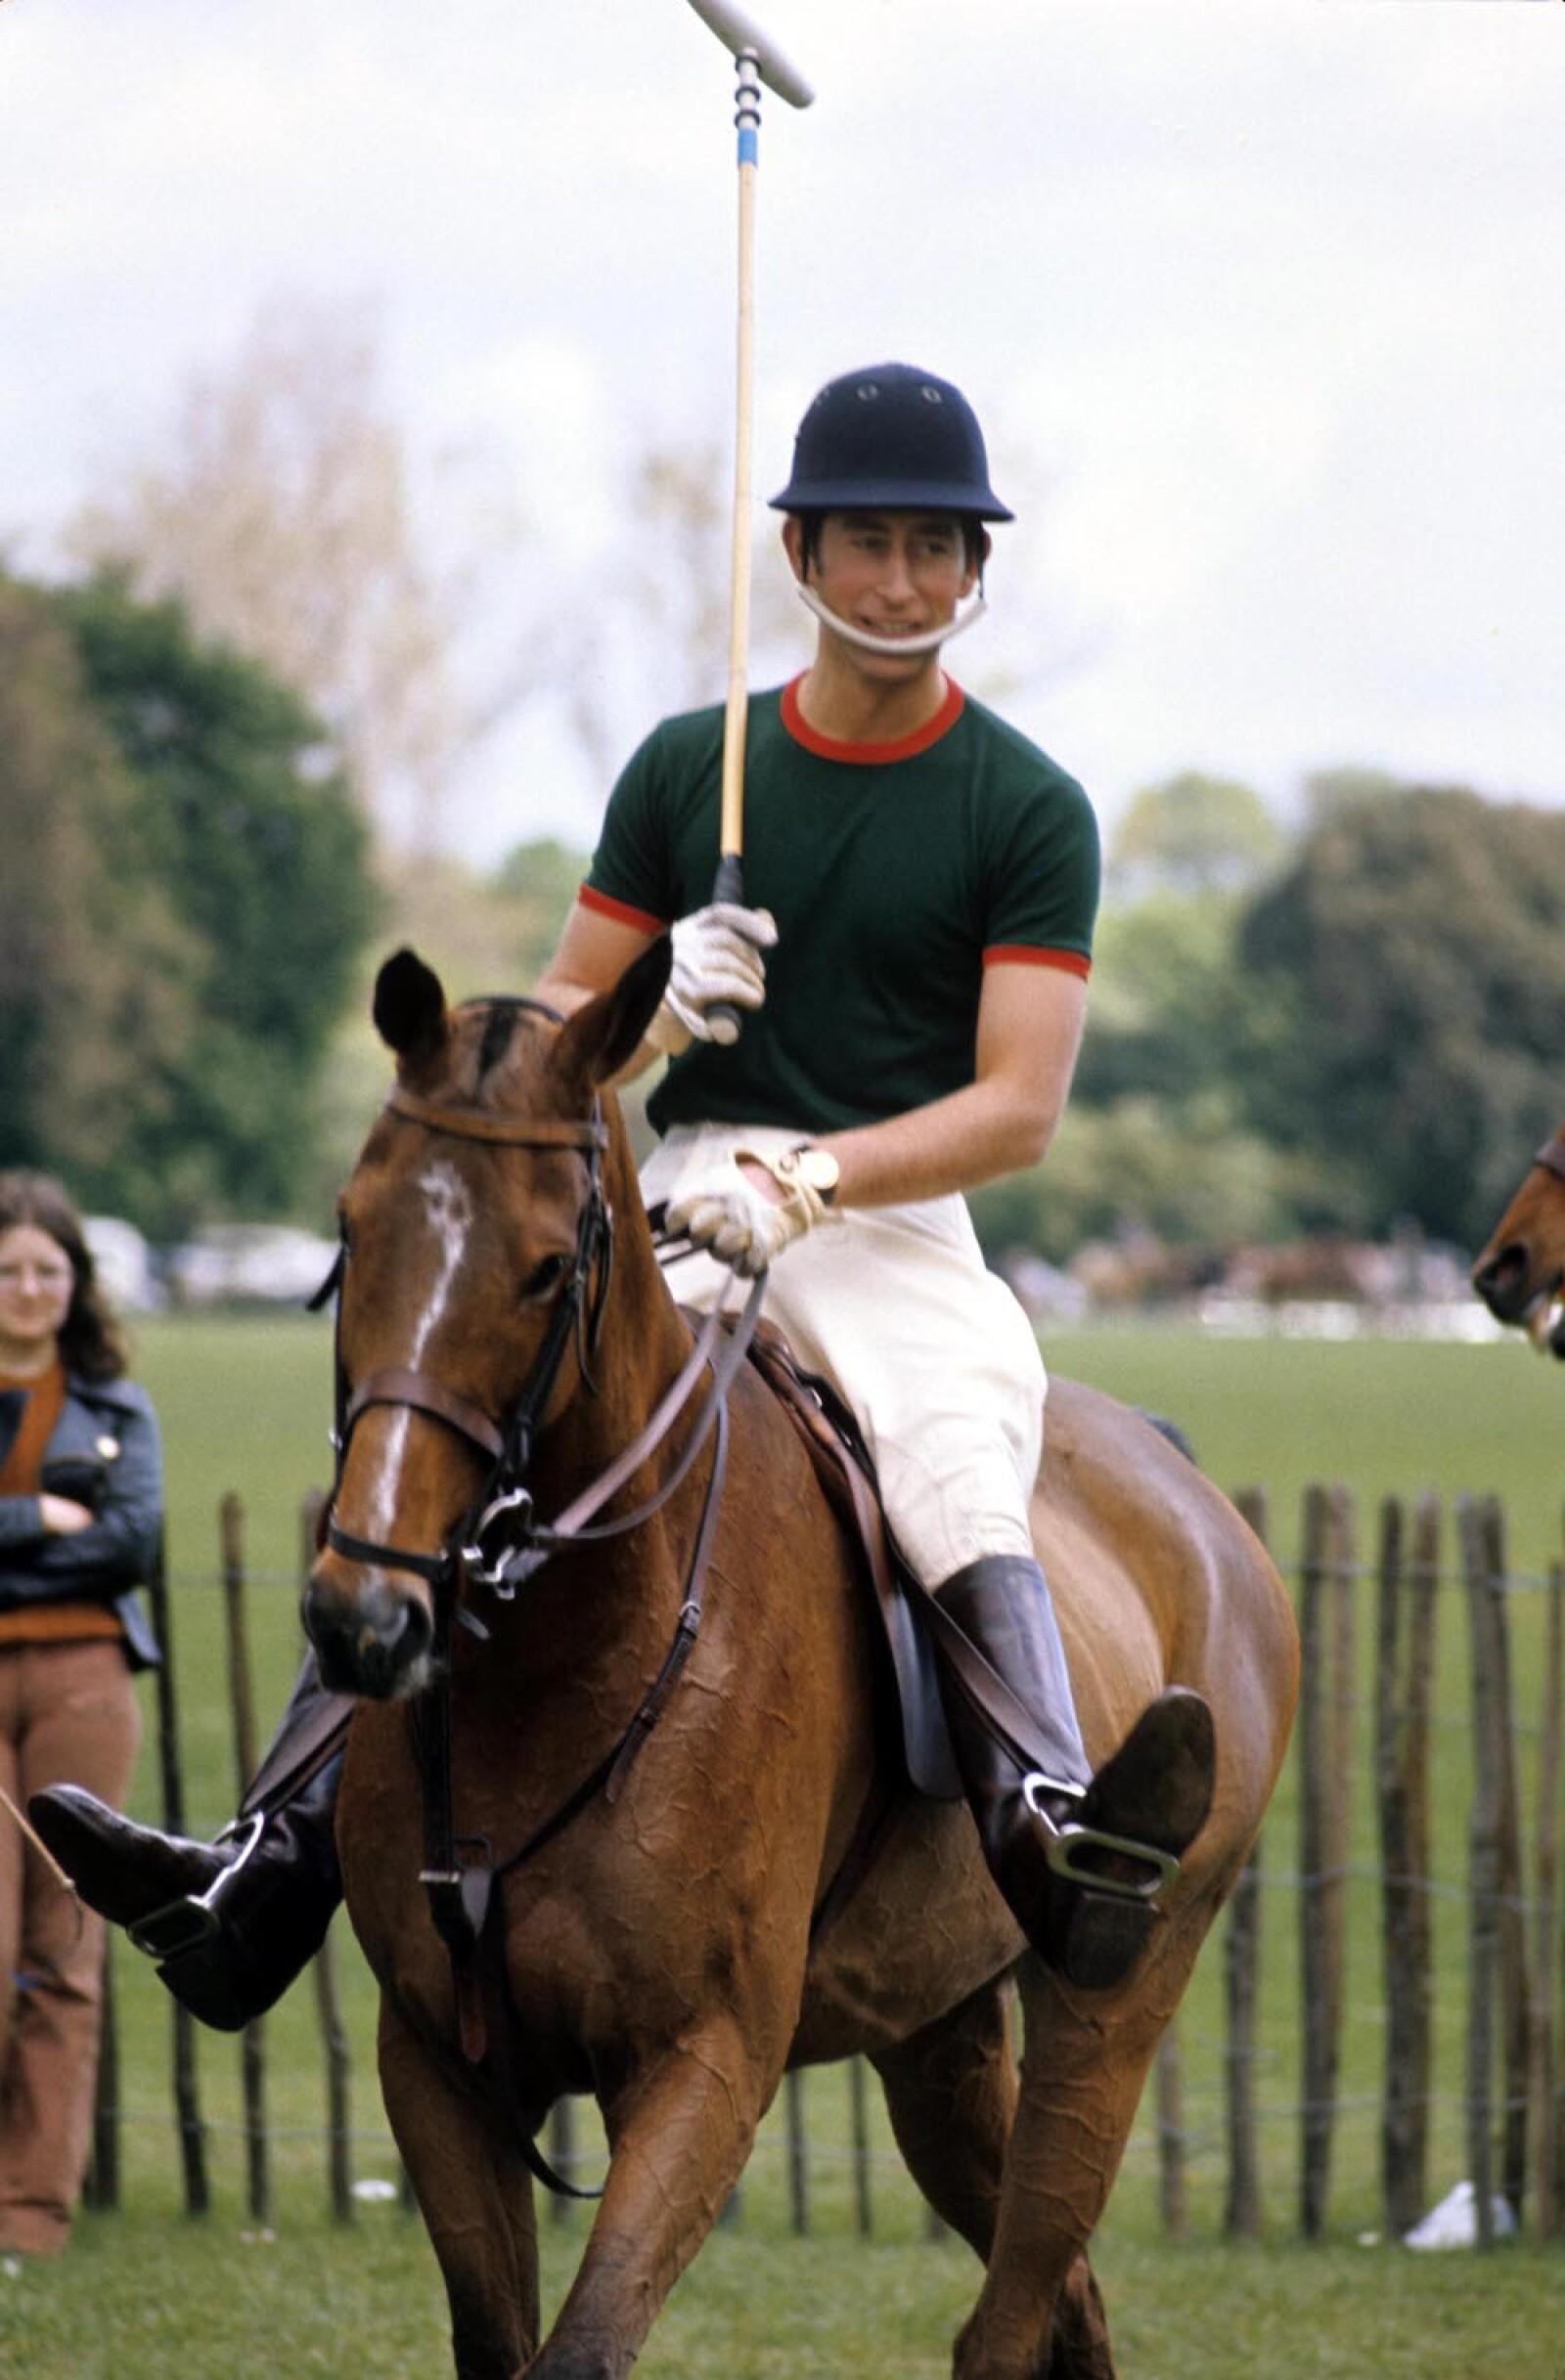 Prince Charles playing polo, Britain - 1974